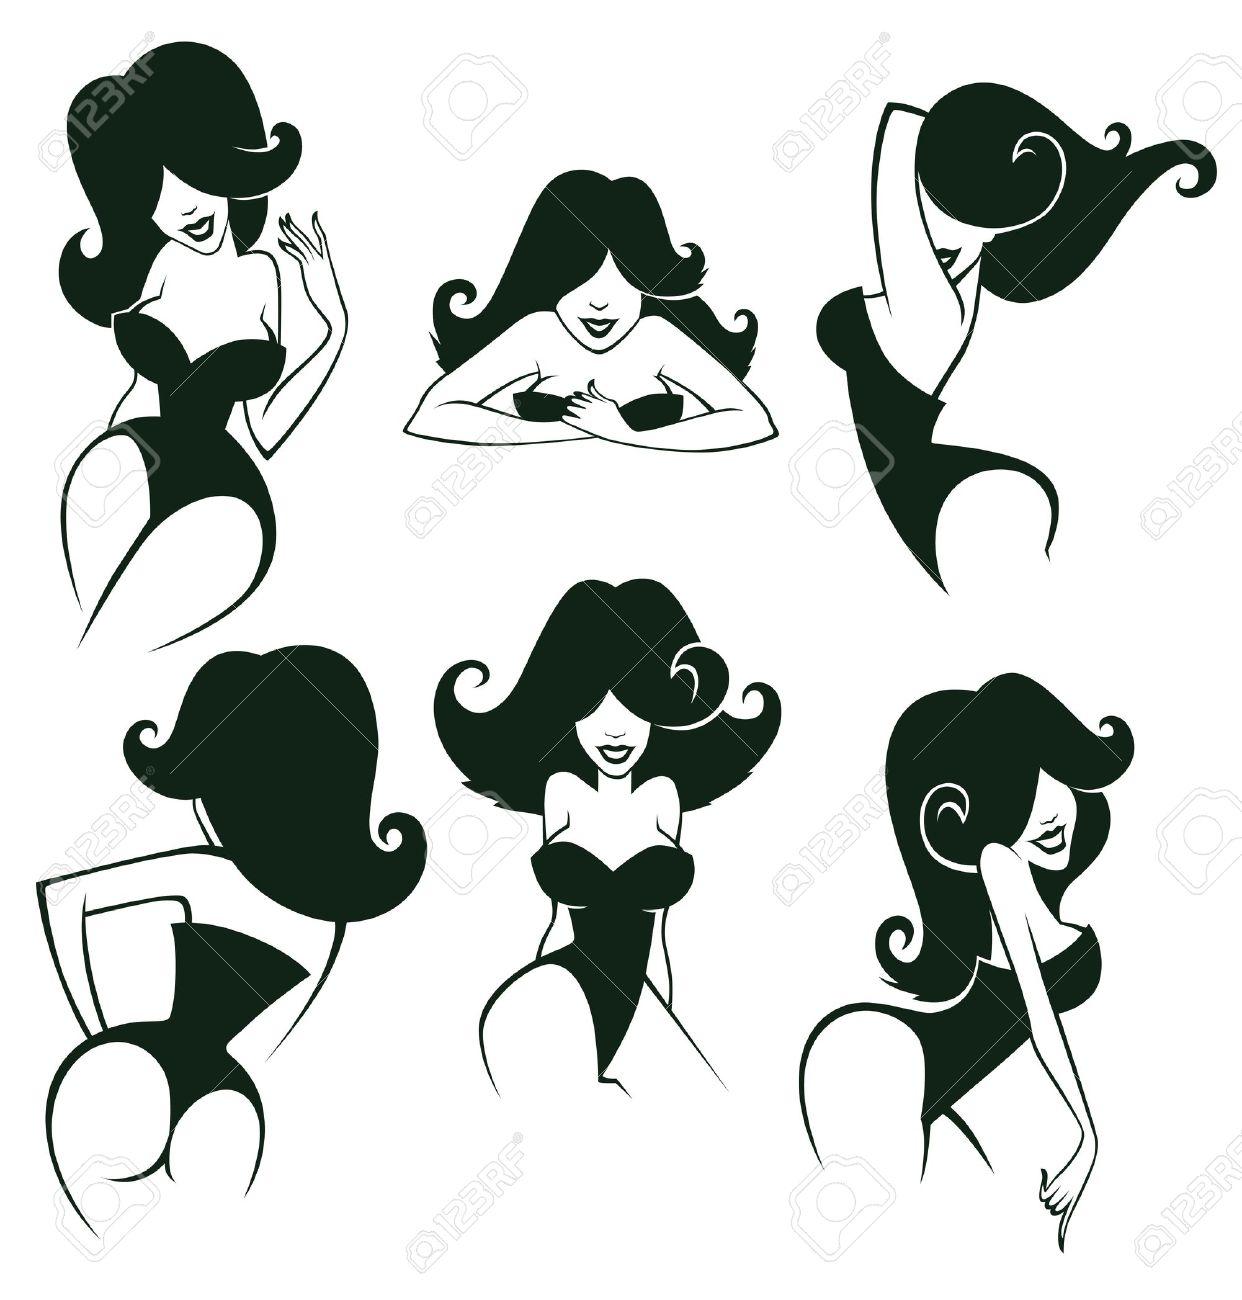 Pin up motorcycle line art jpg - Pin Up Cartoon Girls Images